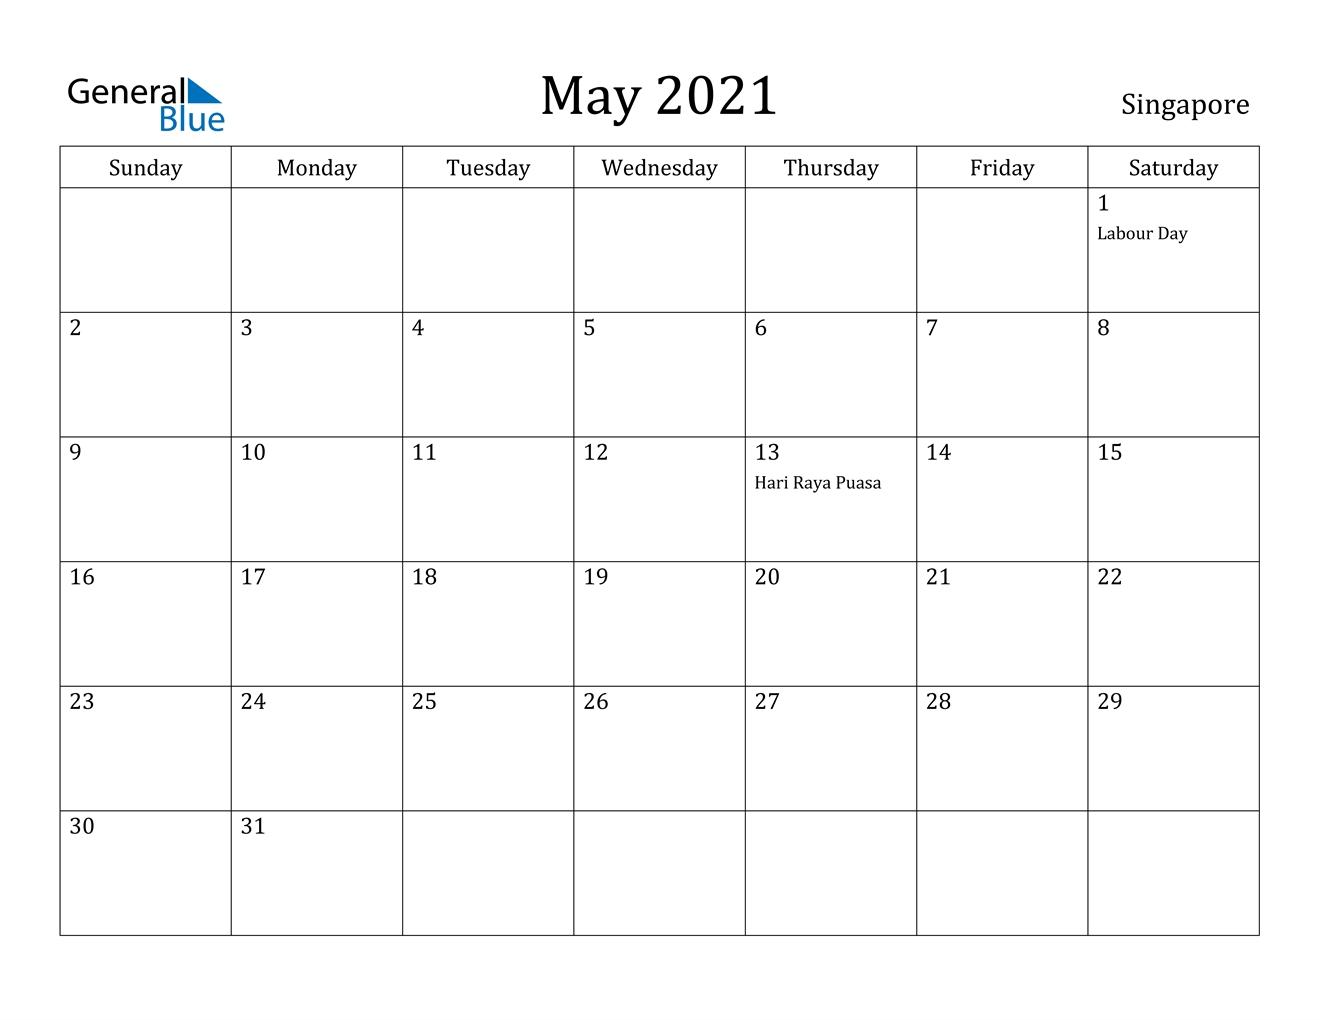 May 2021 Calendar - Singapore regarding 2021 Holidays Calendar Singapore Outlook